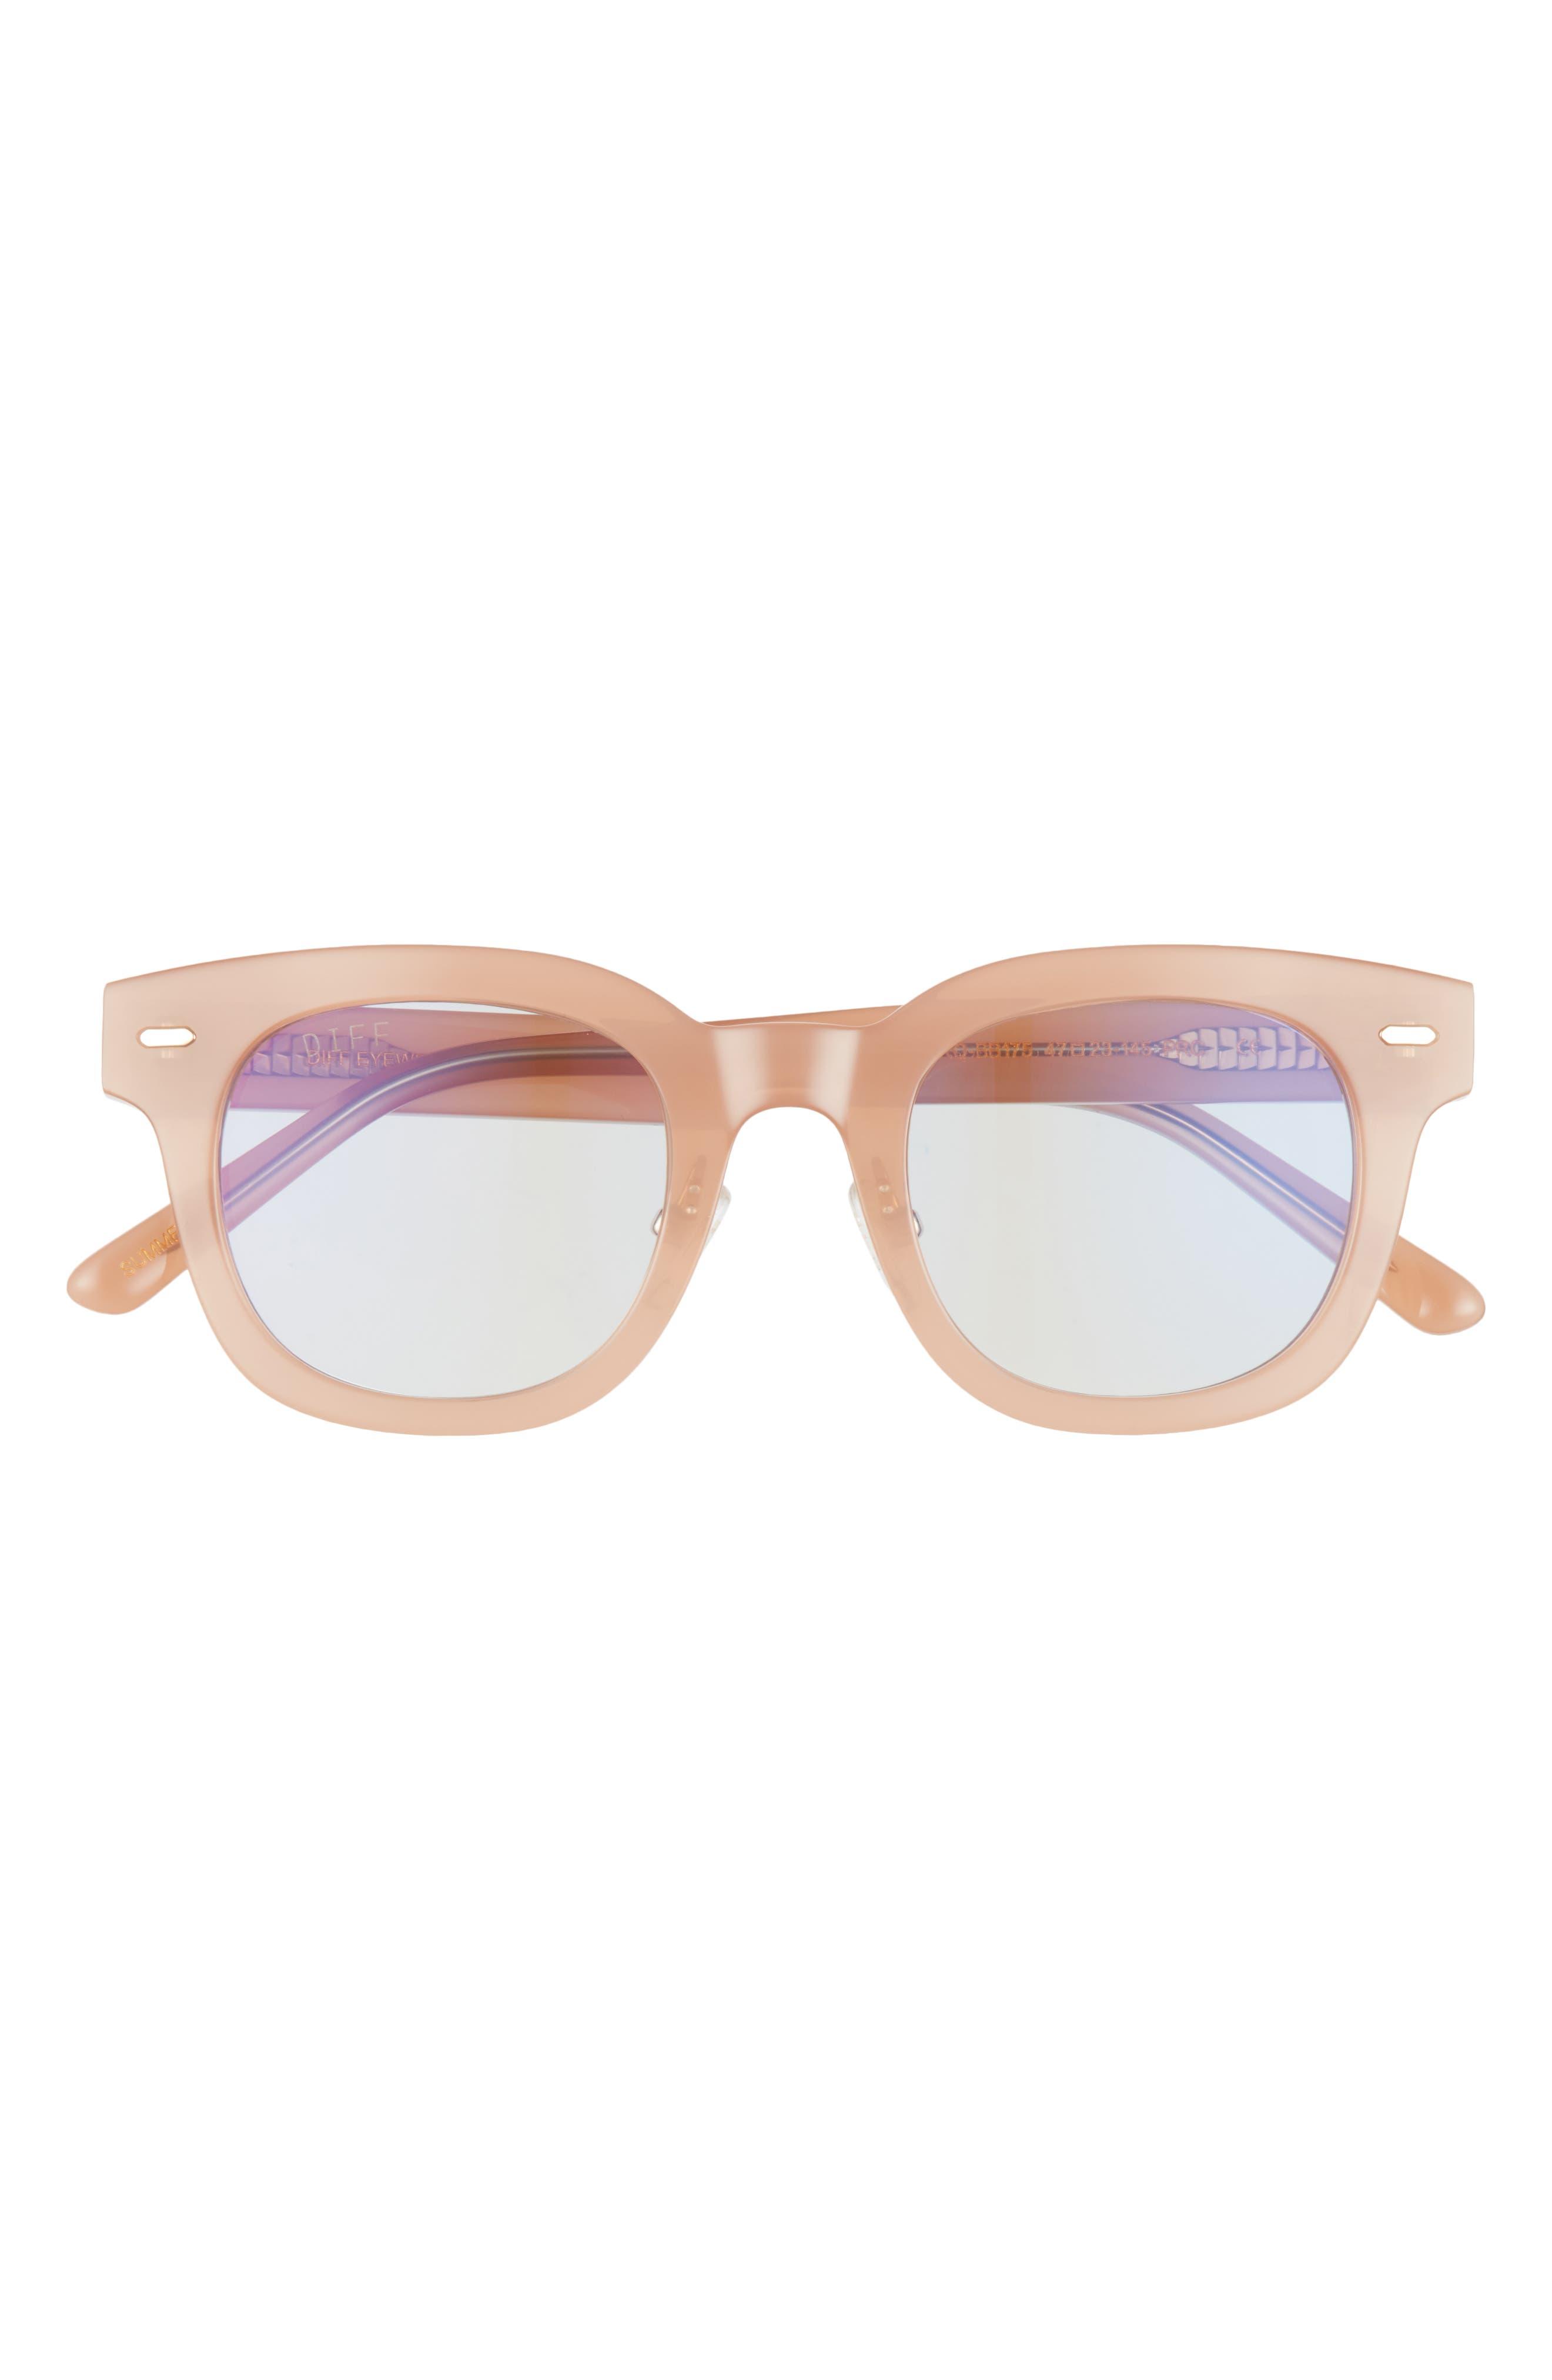 Summer 47mm Blue Light Blocking Glasses